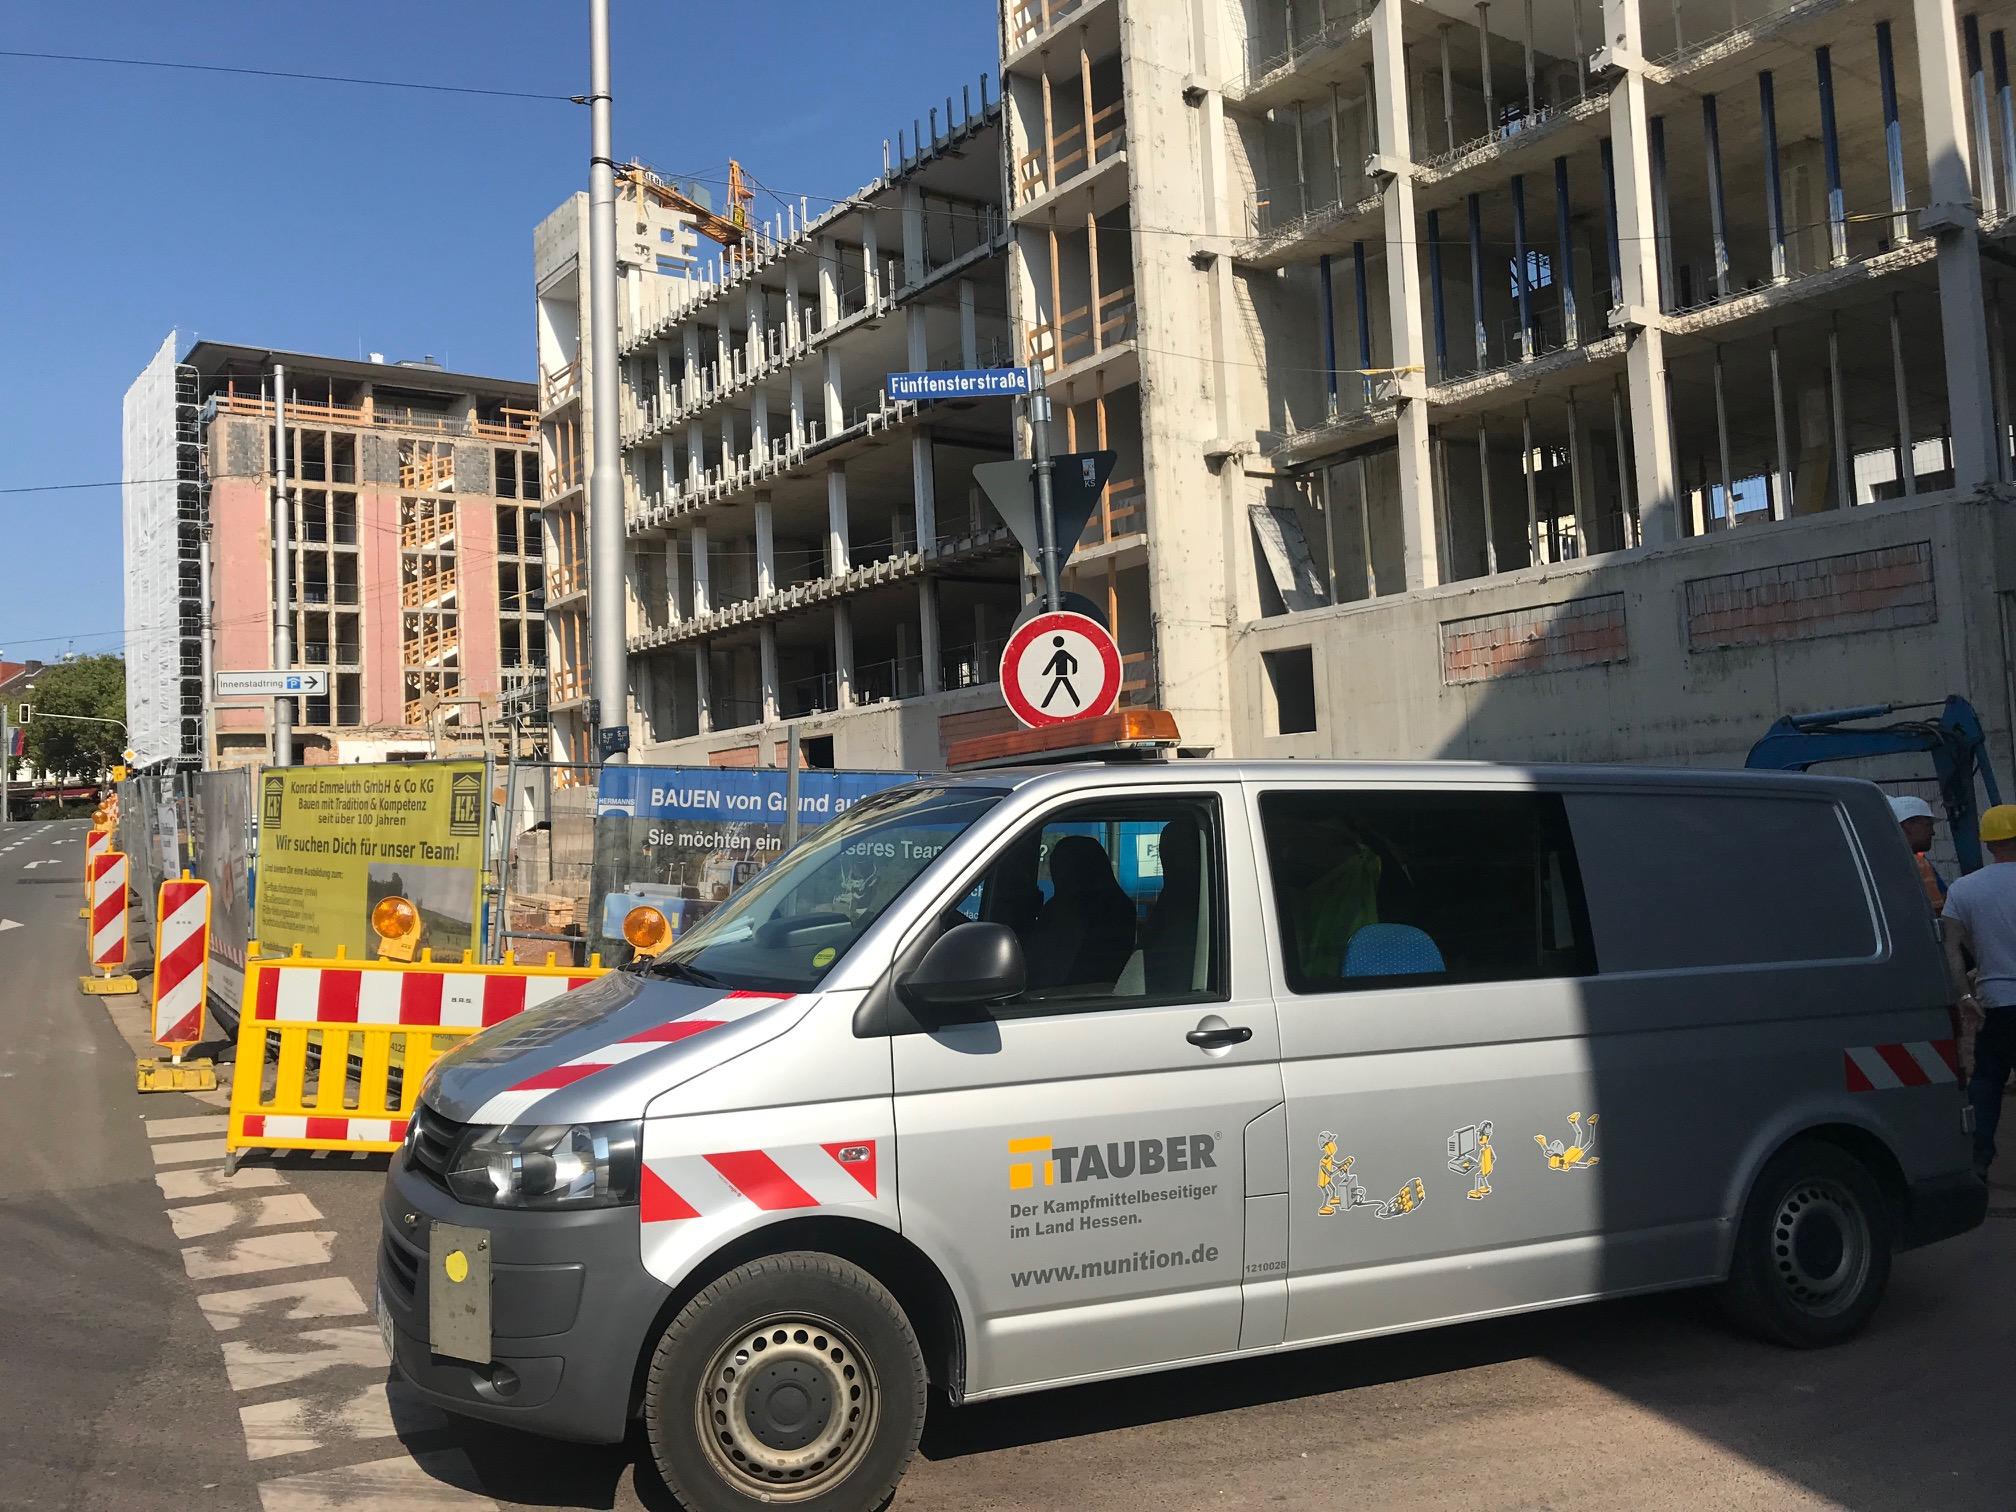 Bombe in Kassel: Weltkriegsbombe in Kassel erfolgreich entschärft ...